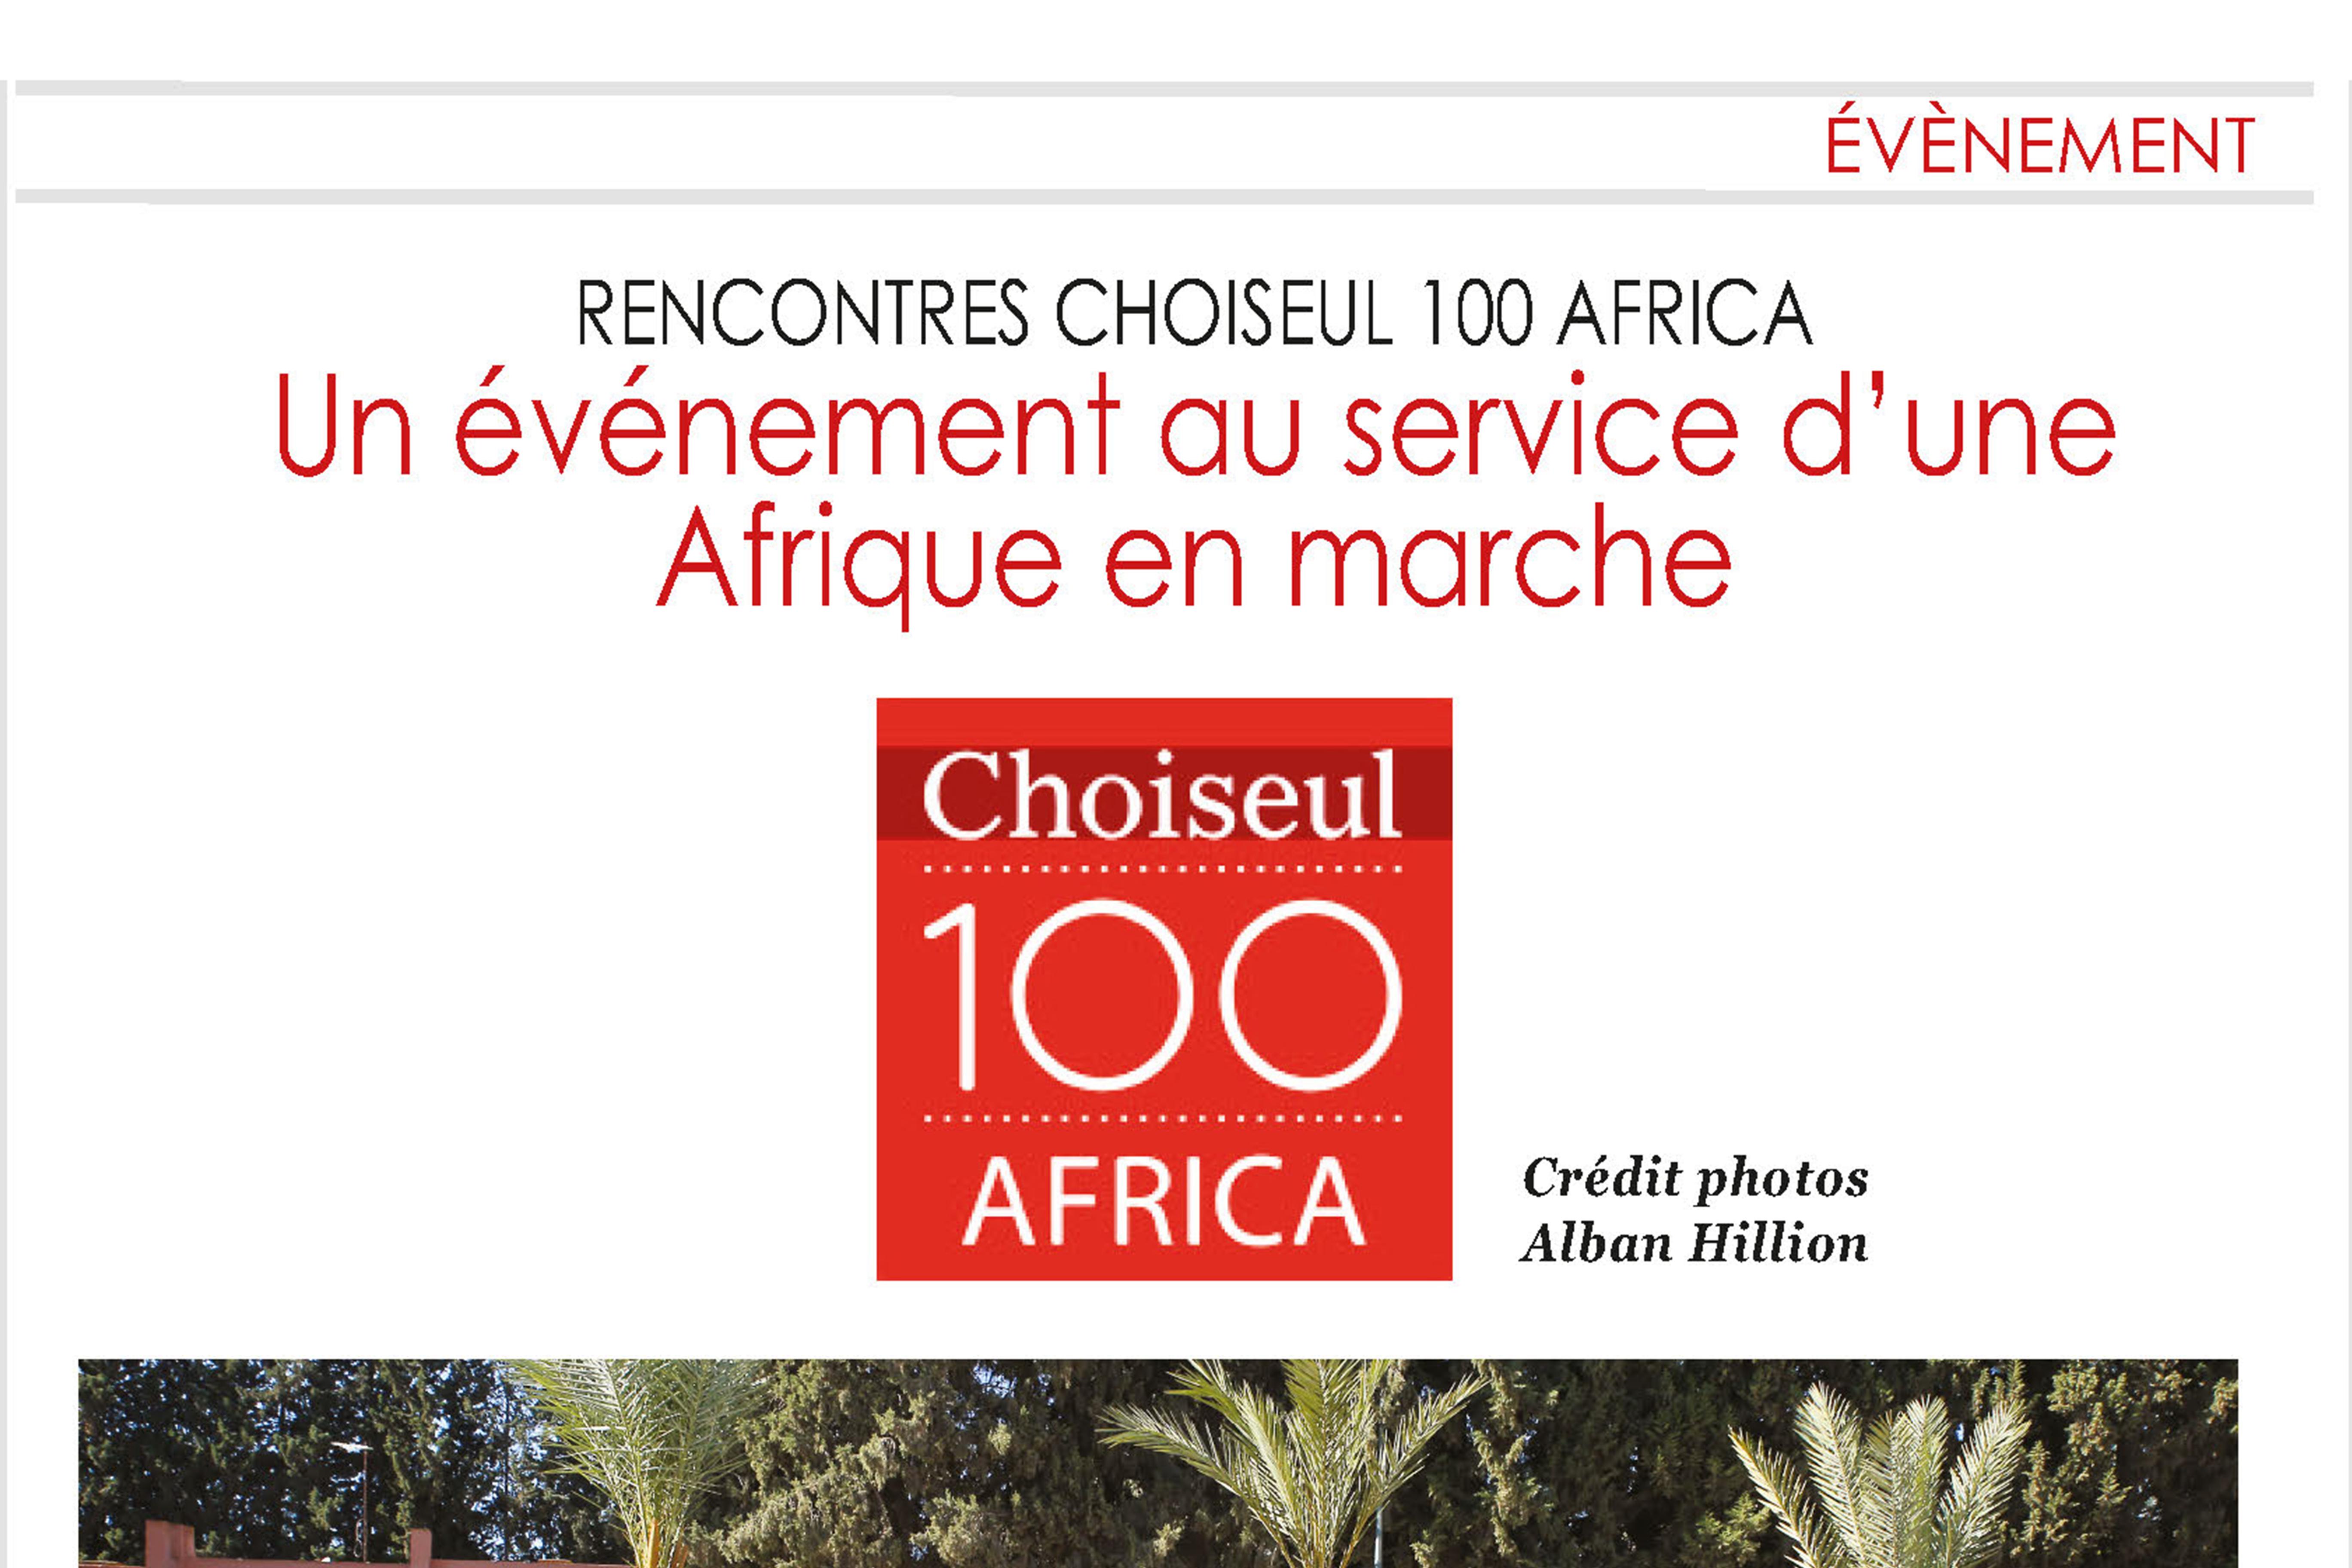 Choiseul 100 Africa à Marrakech – Afriki Presse